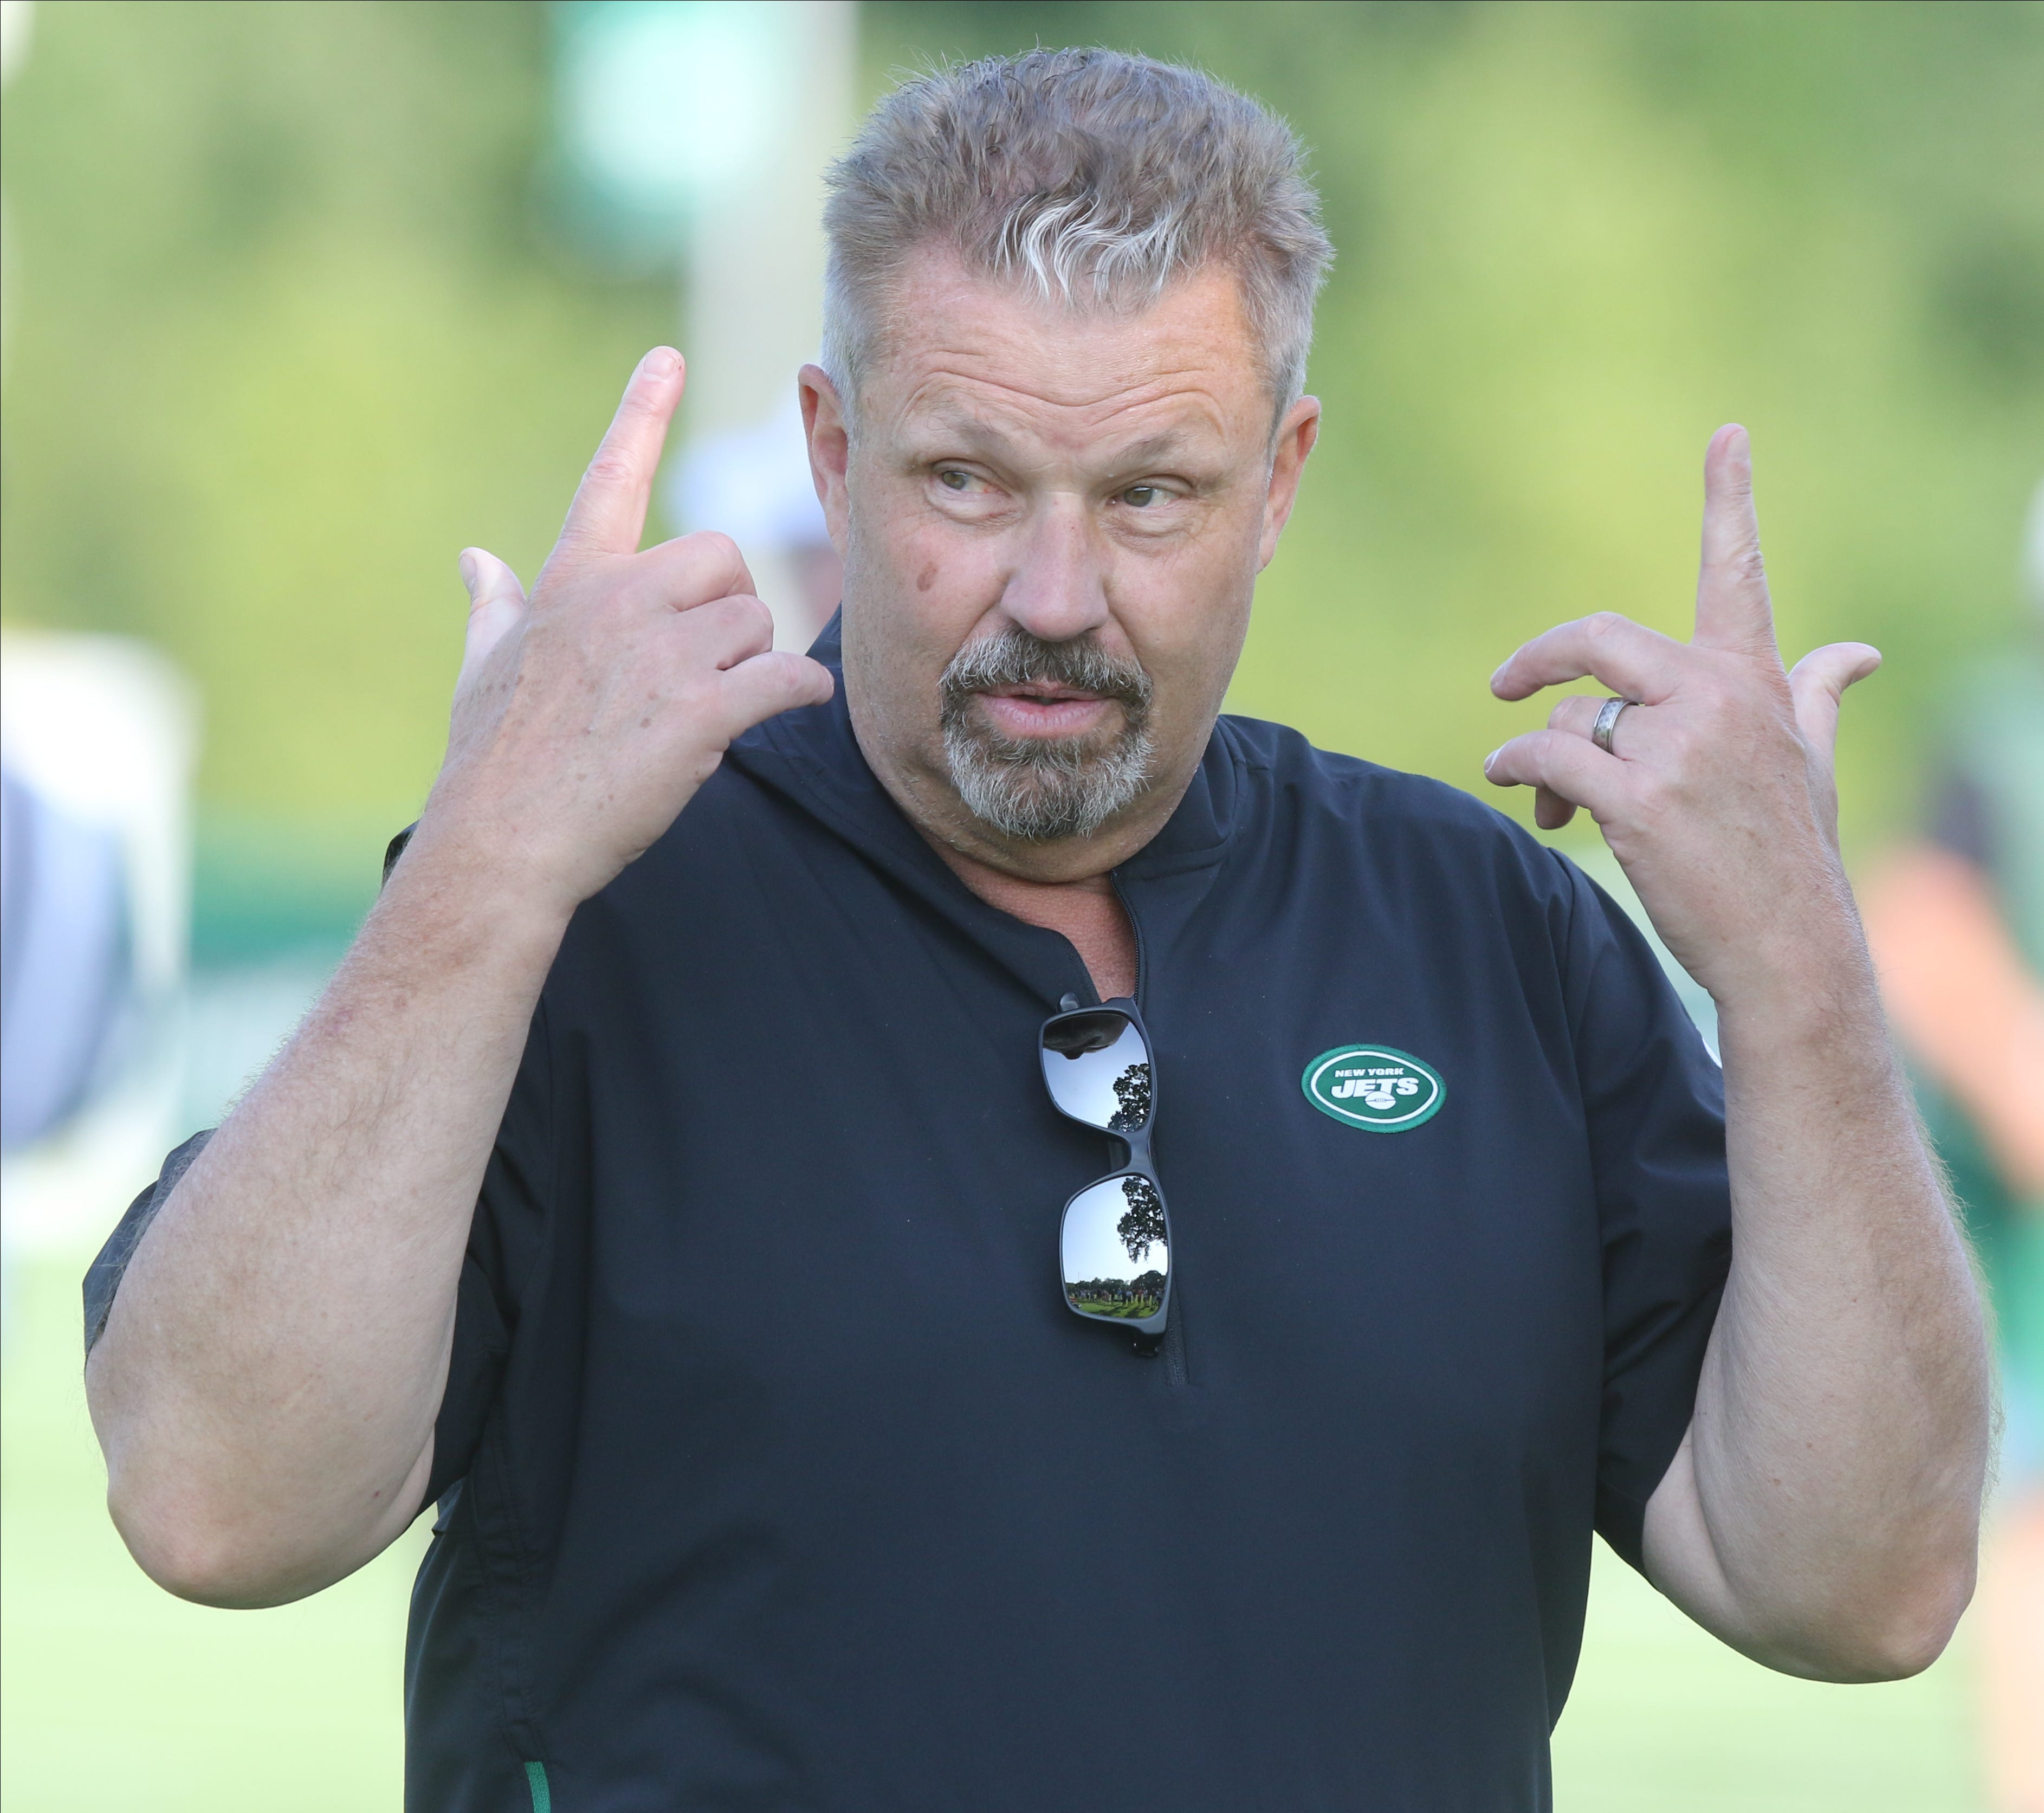 Jets' Gregg Williams dismisses Odell Beckham Jr.'s accusations, gets testy about bountygate